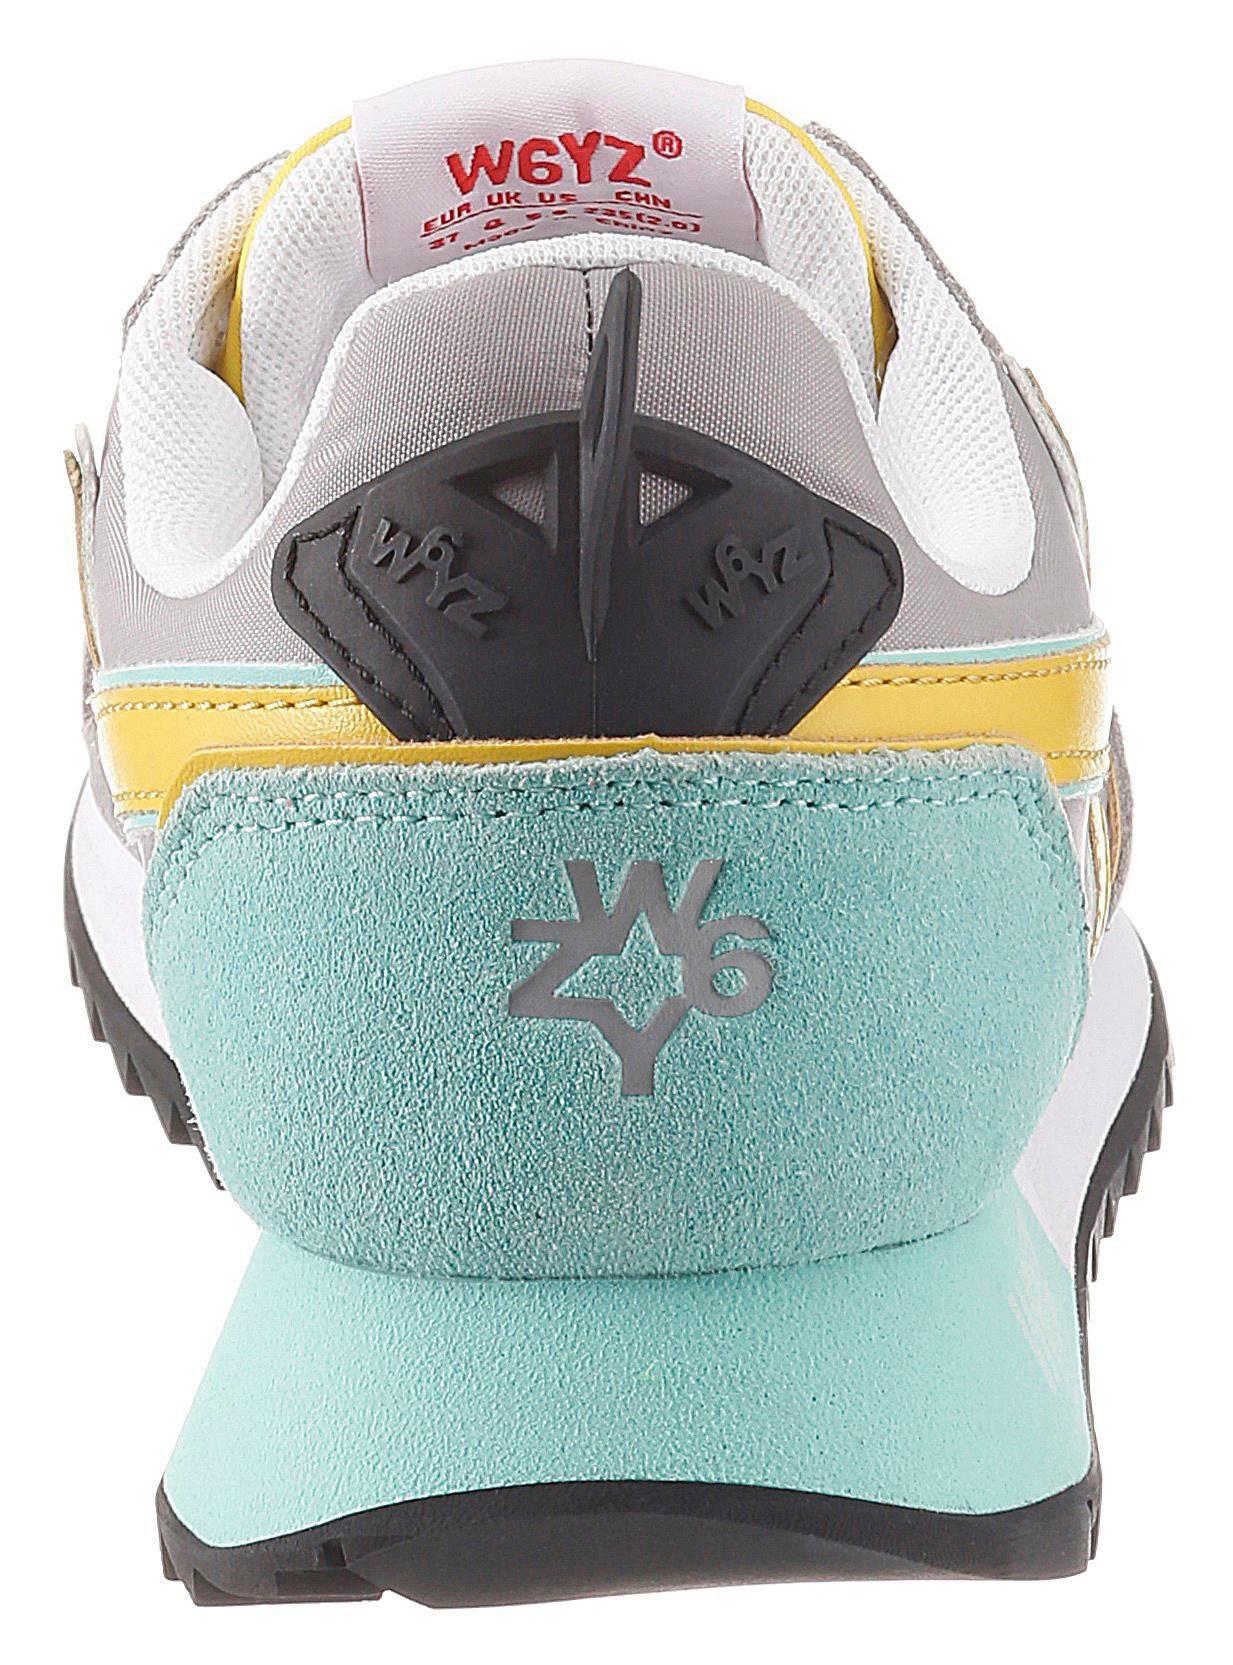 W6yz Sneakers Met Sleehak Snel Online Gekocht - Geweldige Prijs